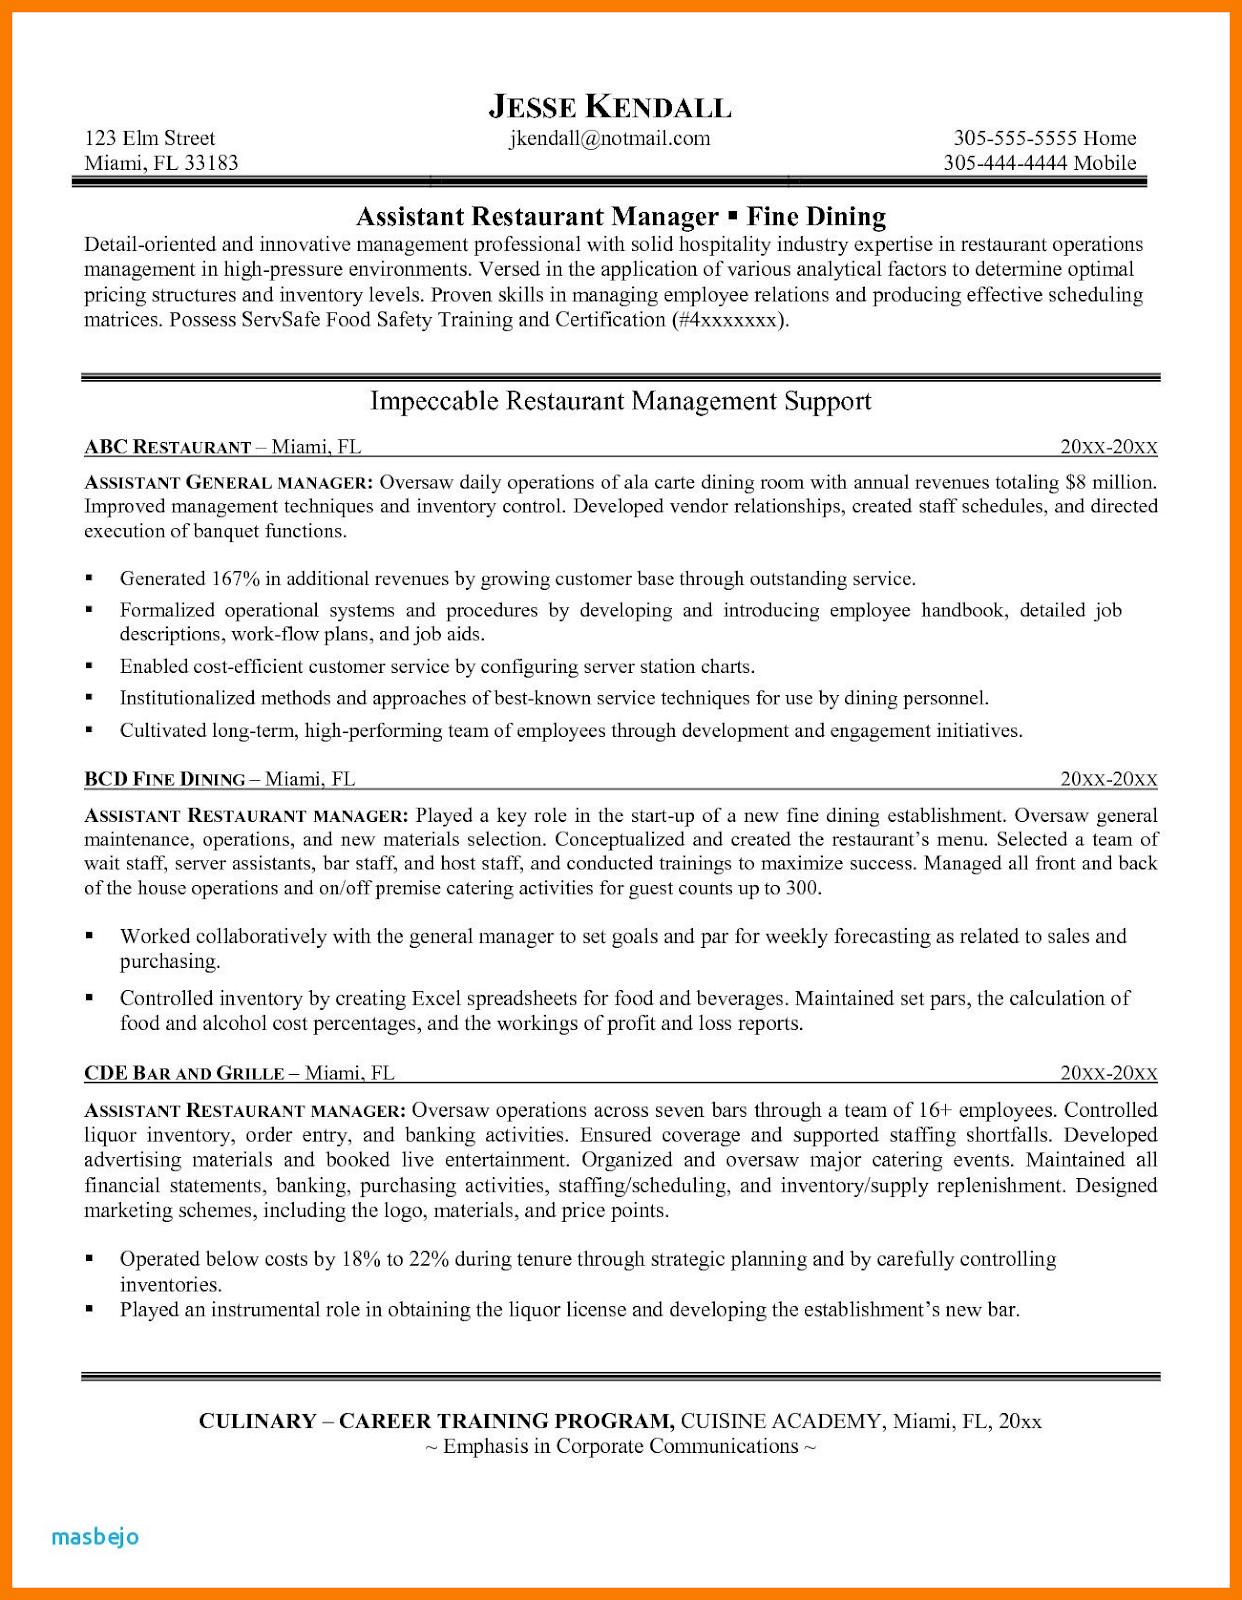 Restaurant Manager Resume Sample Restaurant Manager Resume Samples Pdf Restaurant Manager Resume S Restaurant Management Manager Resume Operations Management